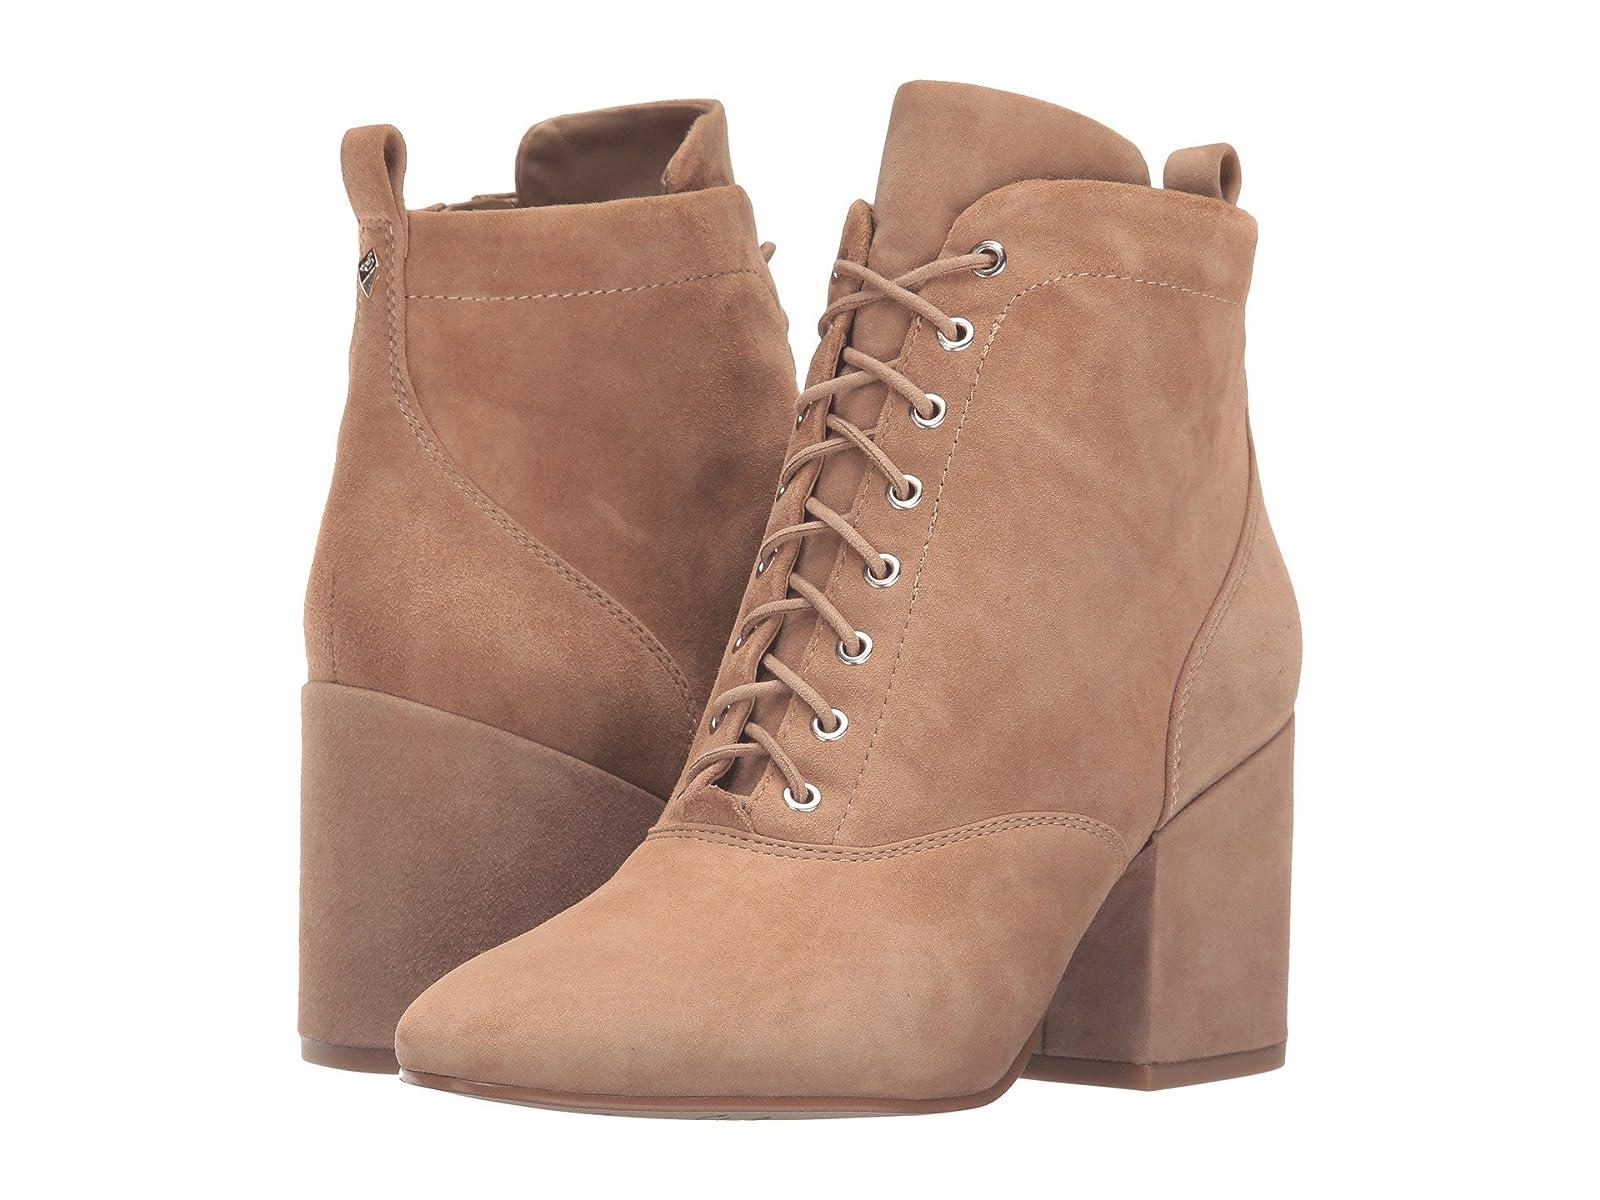 Sam Edelman TateCheap and distinctive eye-catching shoes